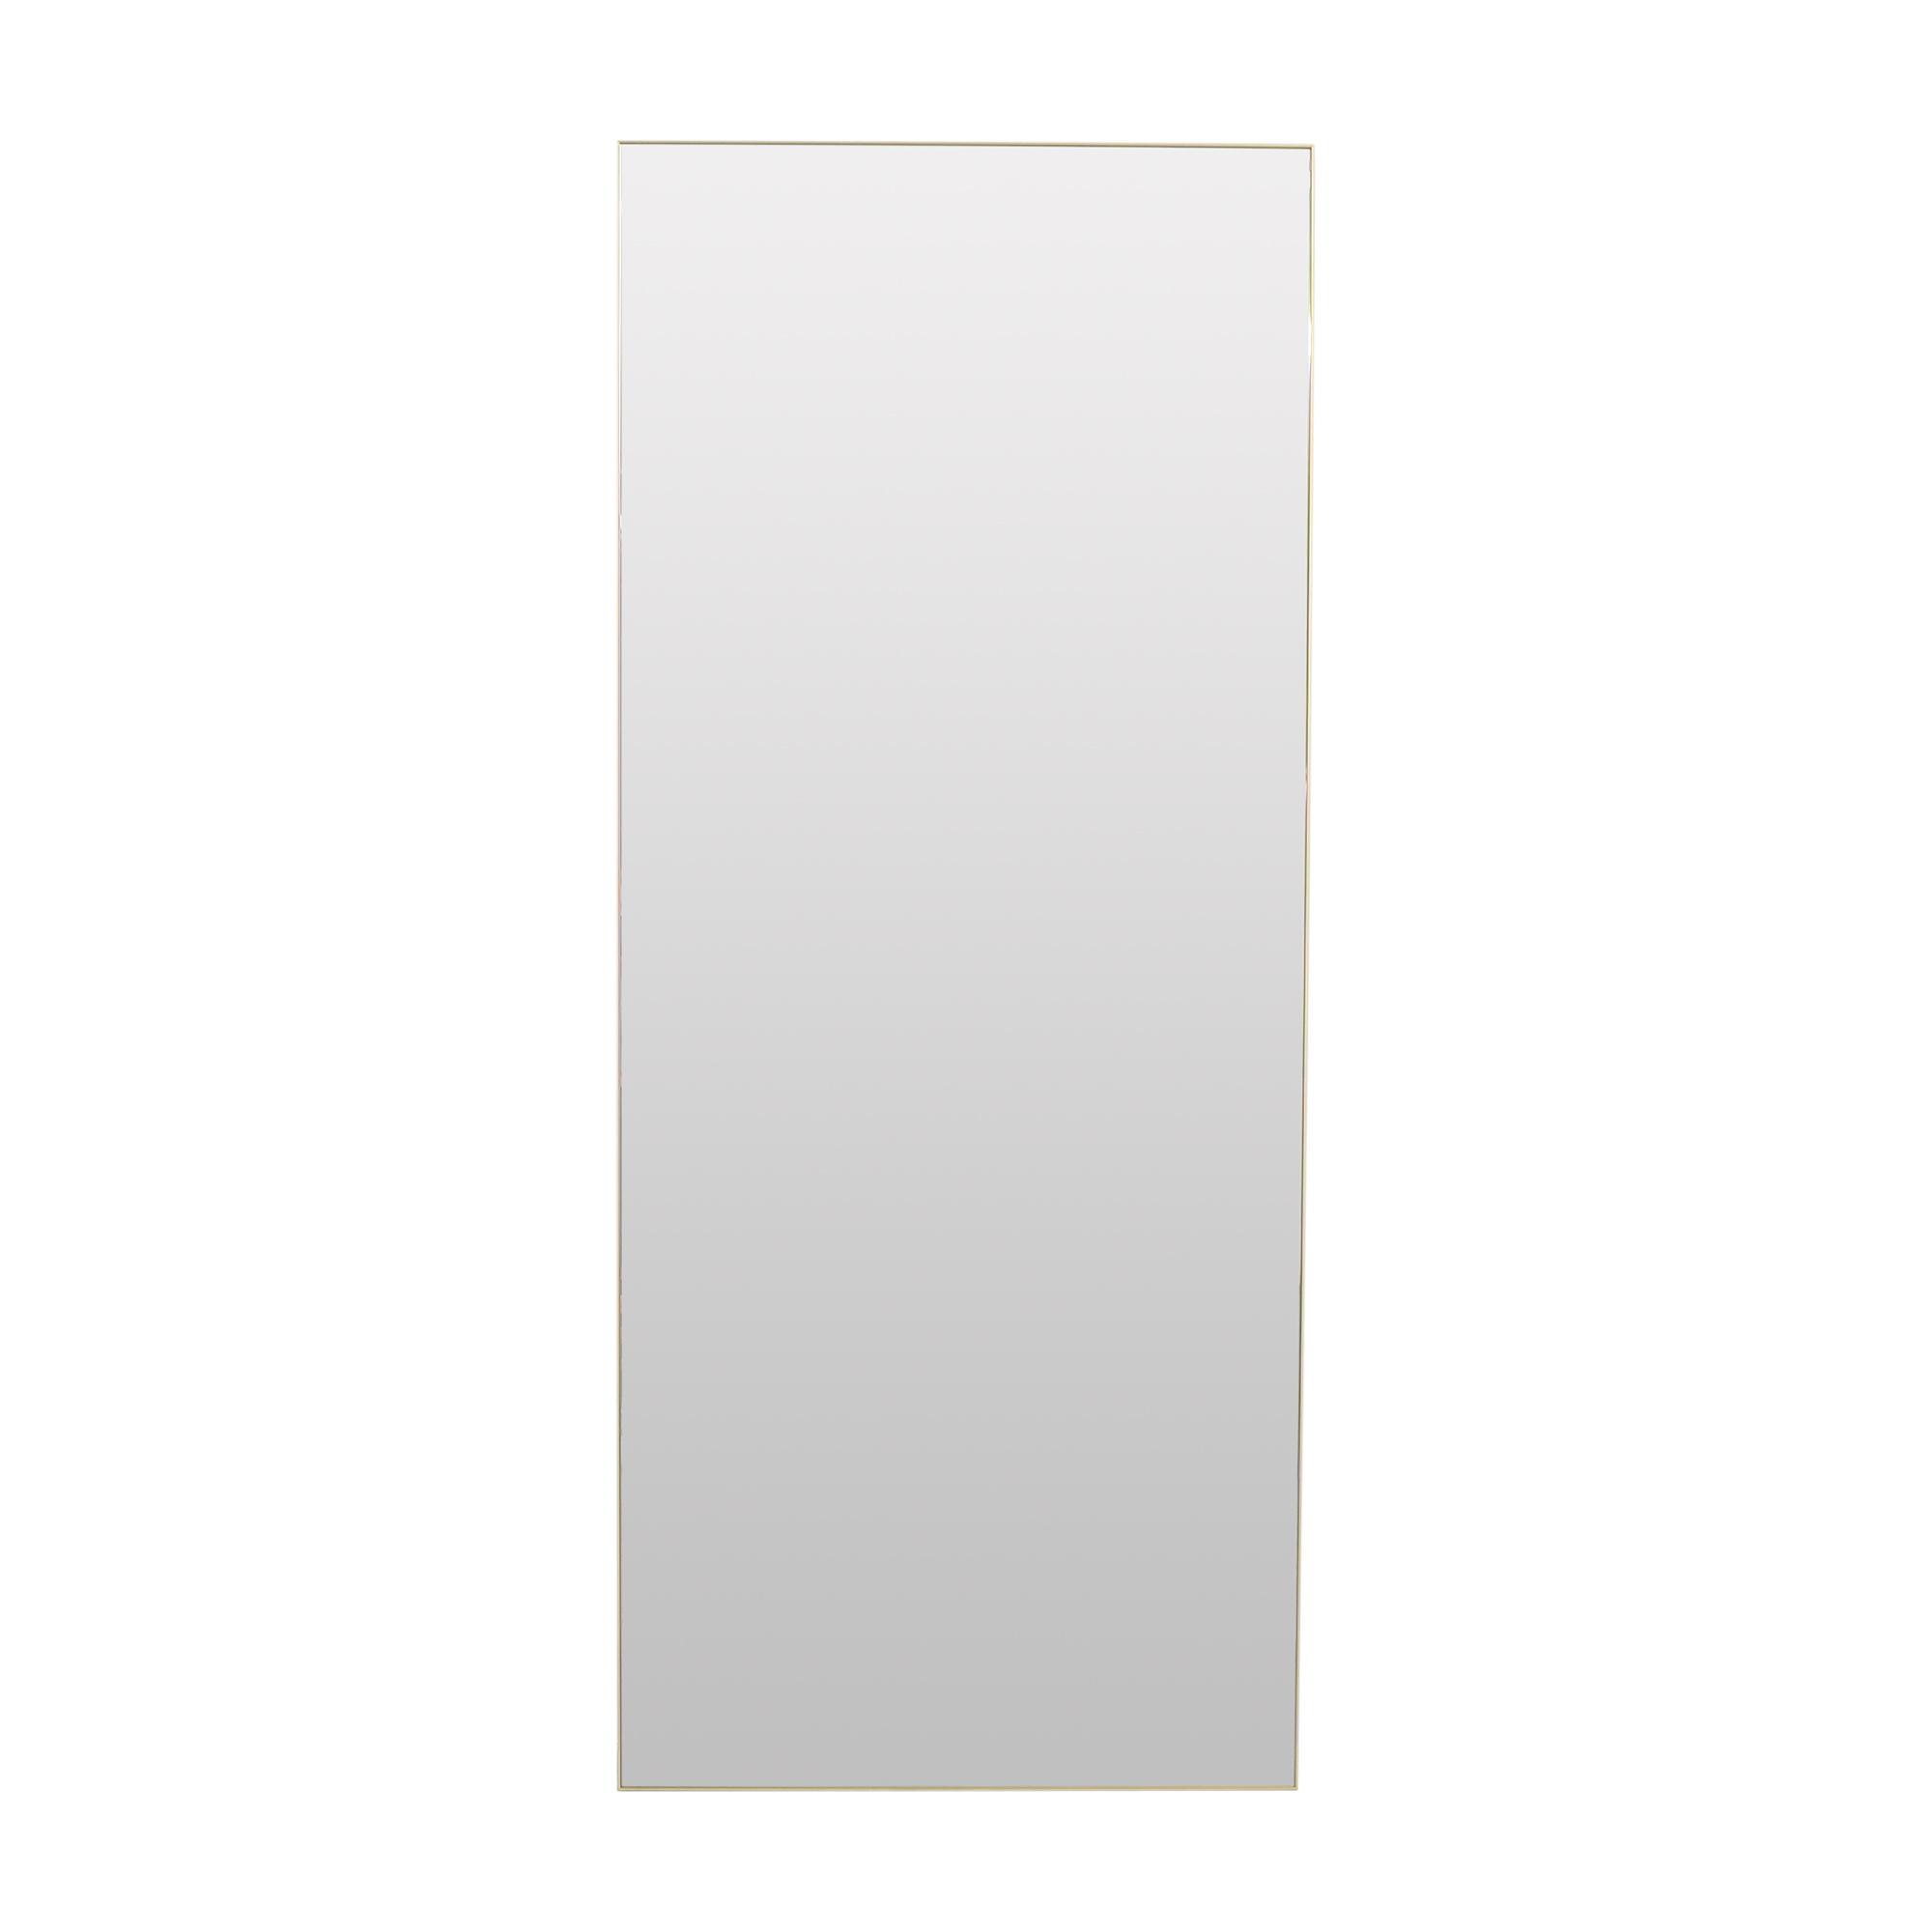 CB2 CB2 Infinity Floor Mirror ma